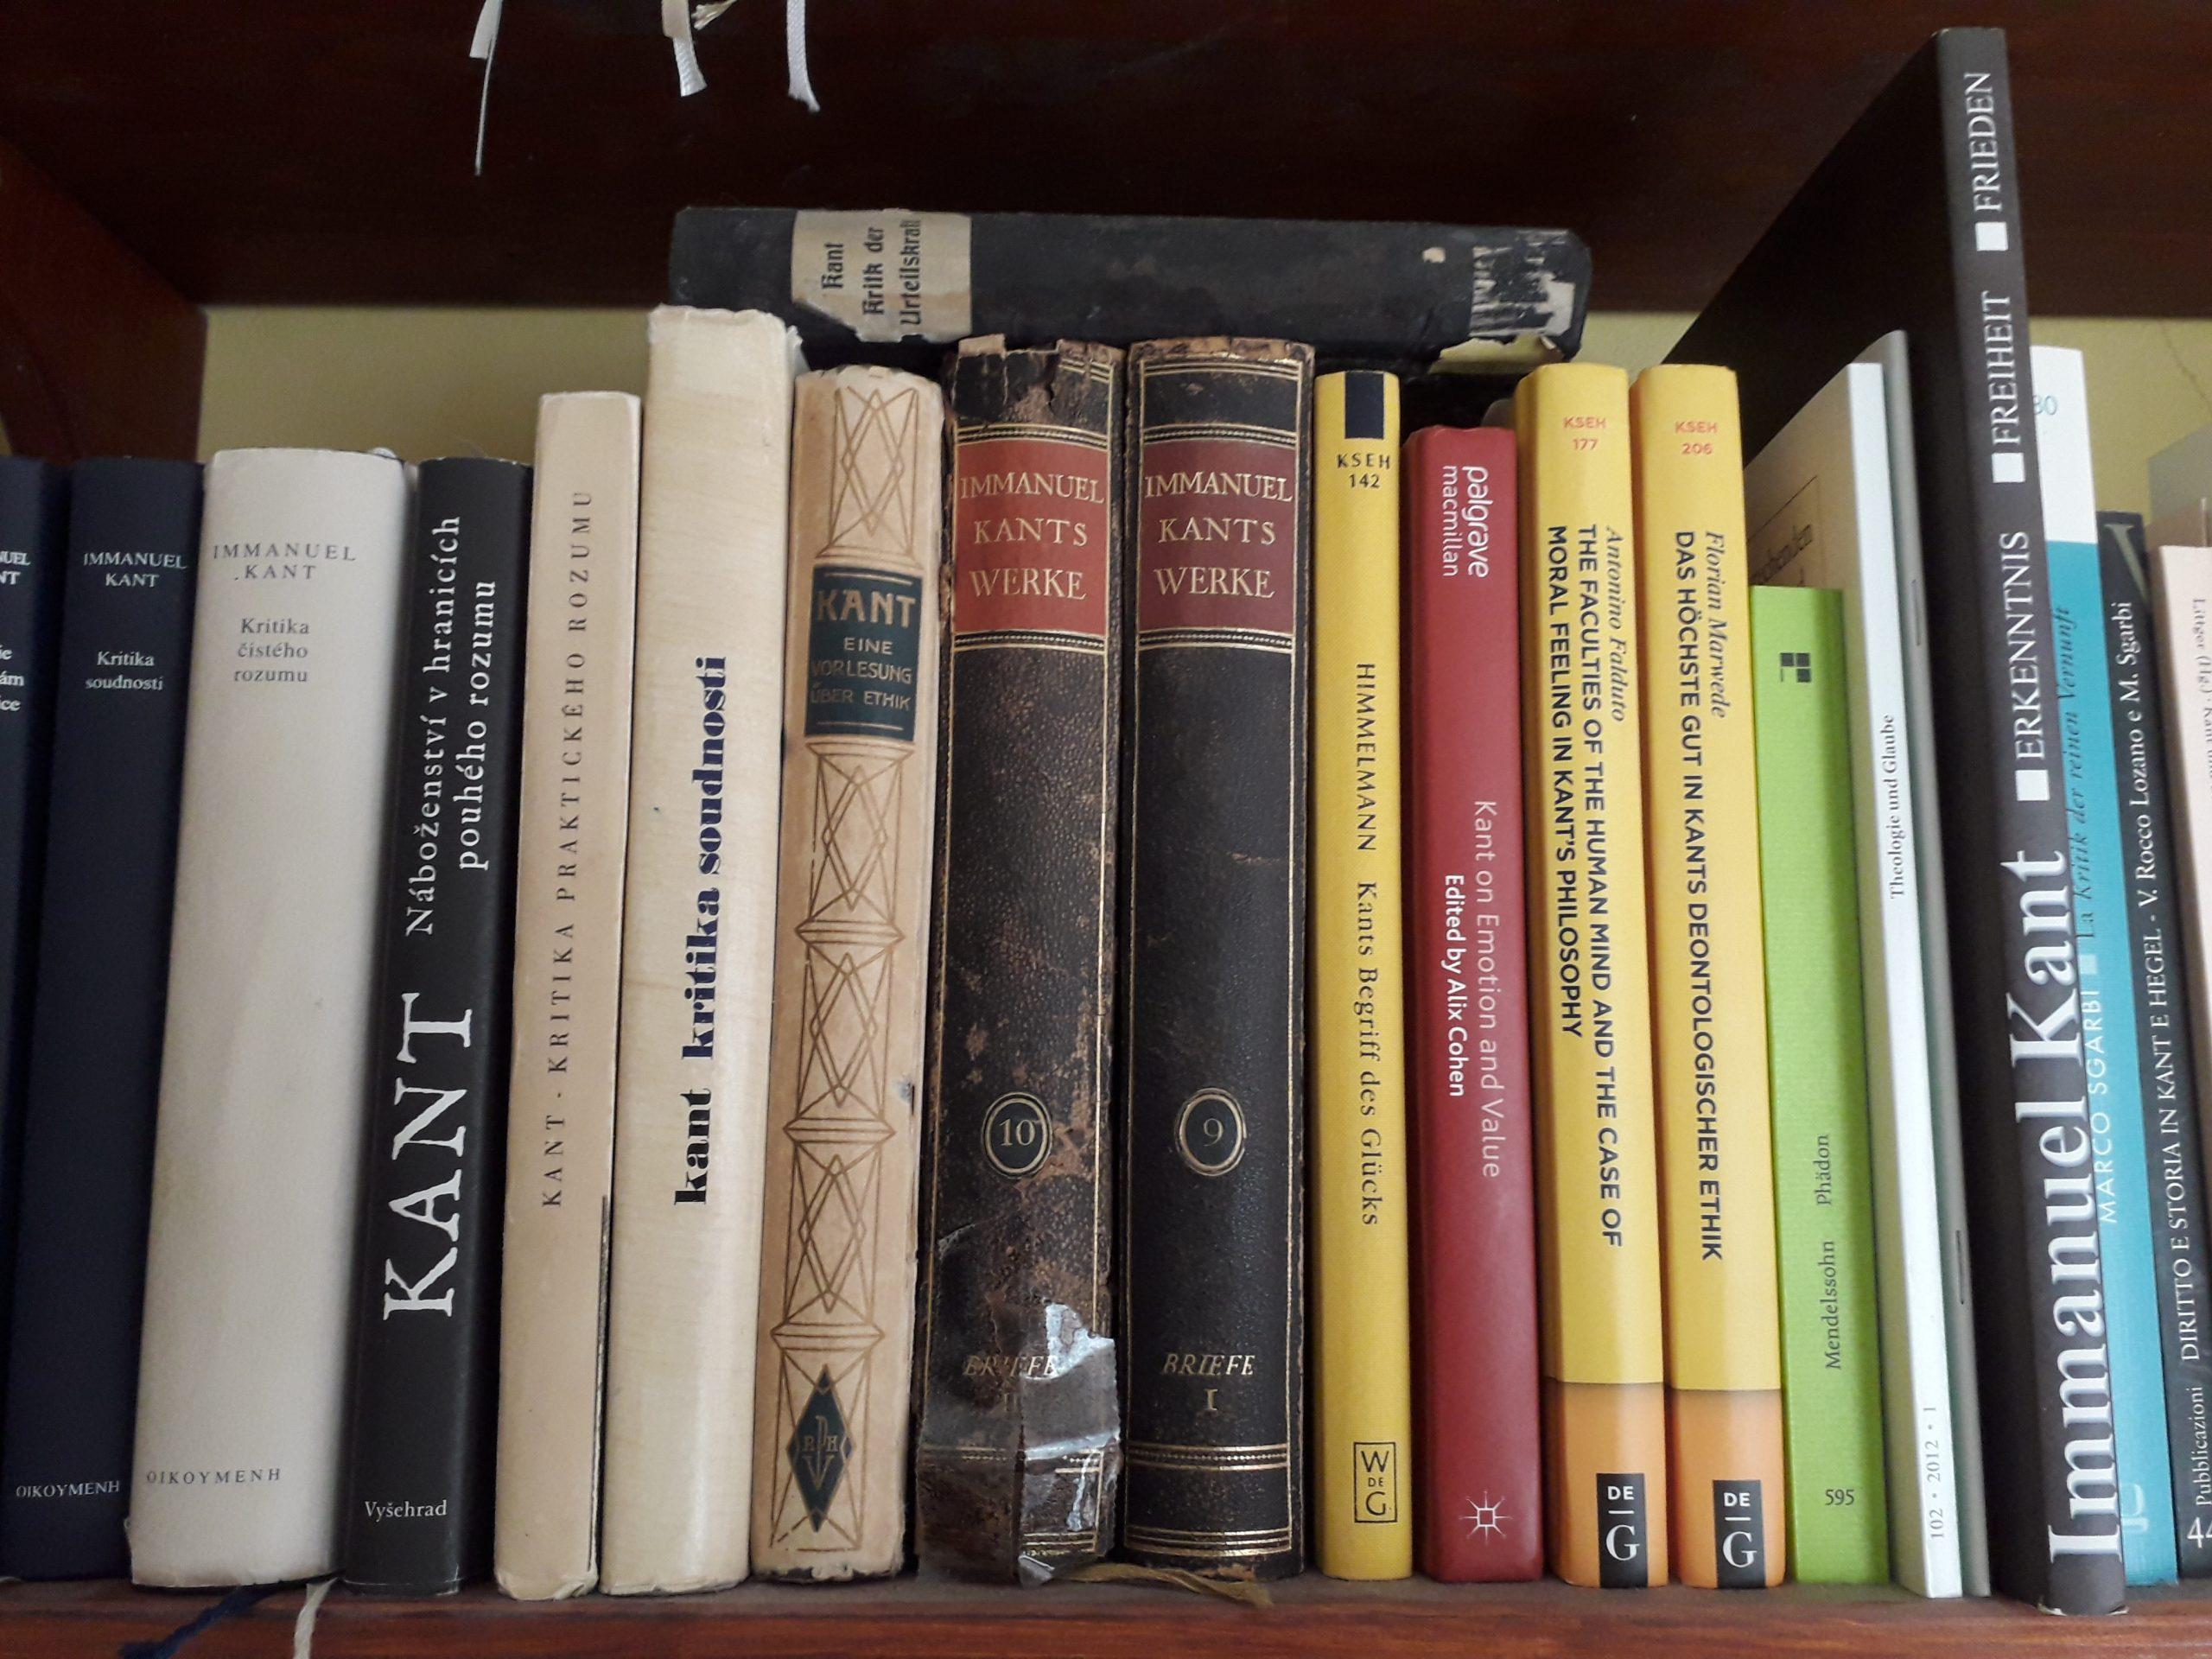 Knihy - I. Kant